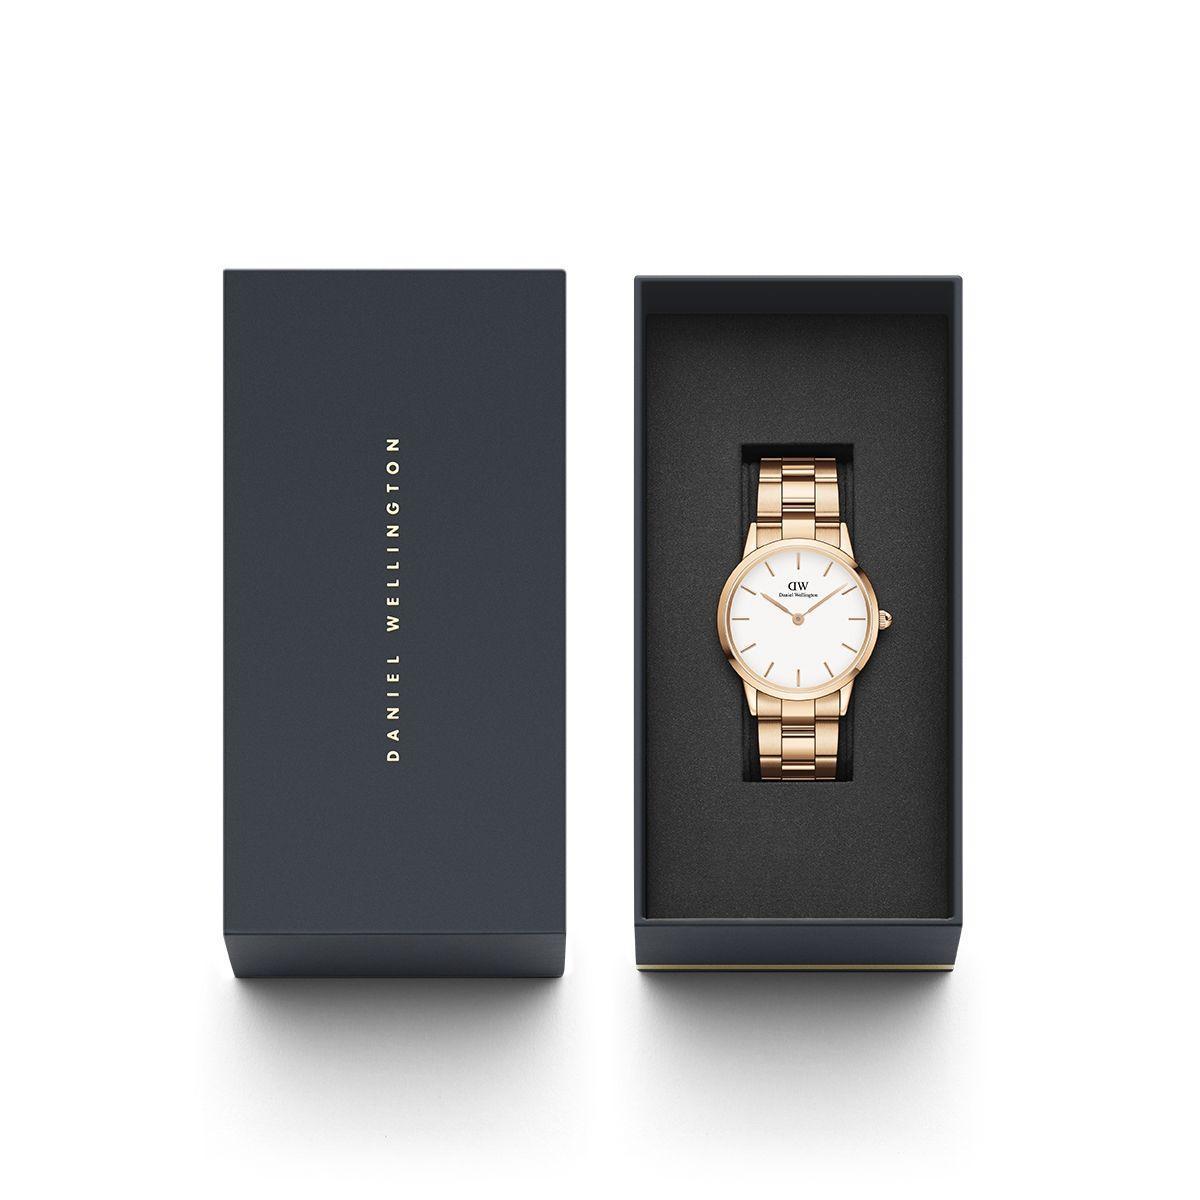 dw官网 dw手表官网 dw中国官网 dw官方旗舰店 DW DW官网  Watch Iconic Link RG 36mm